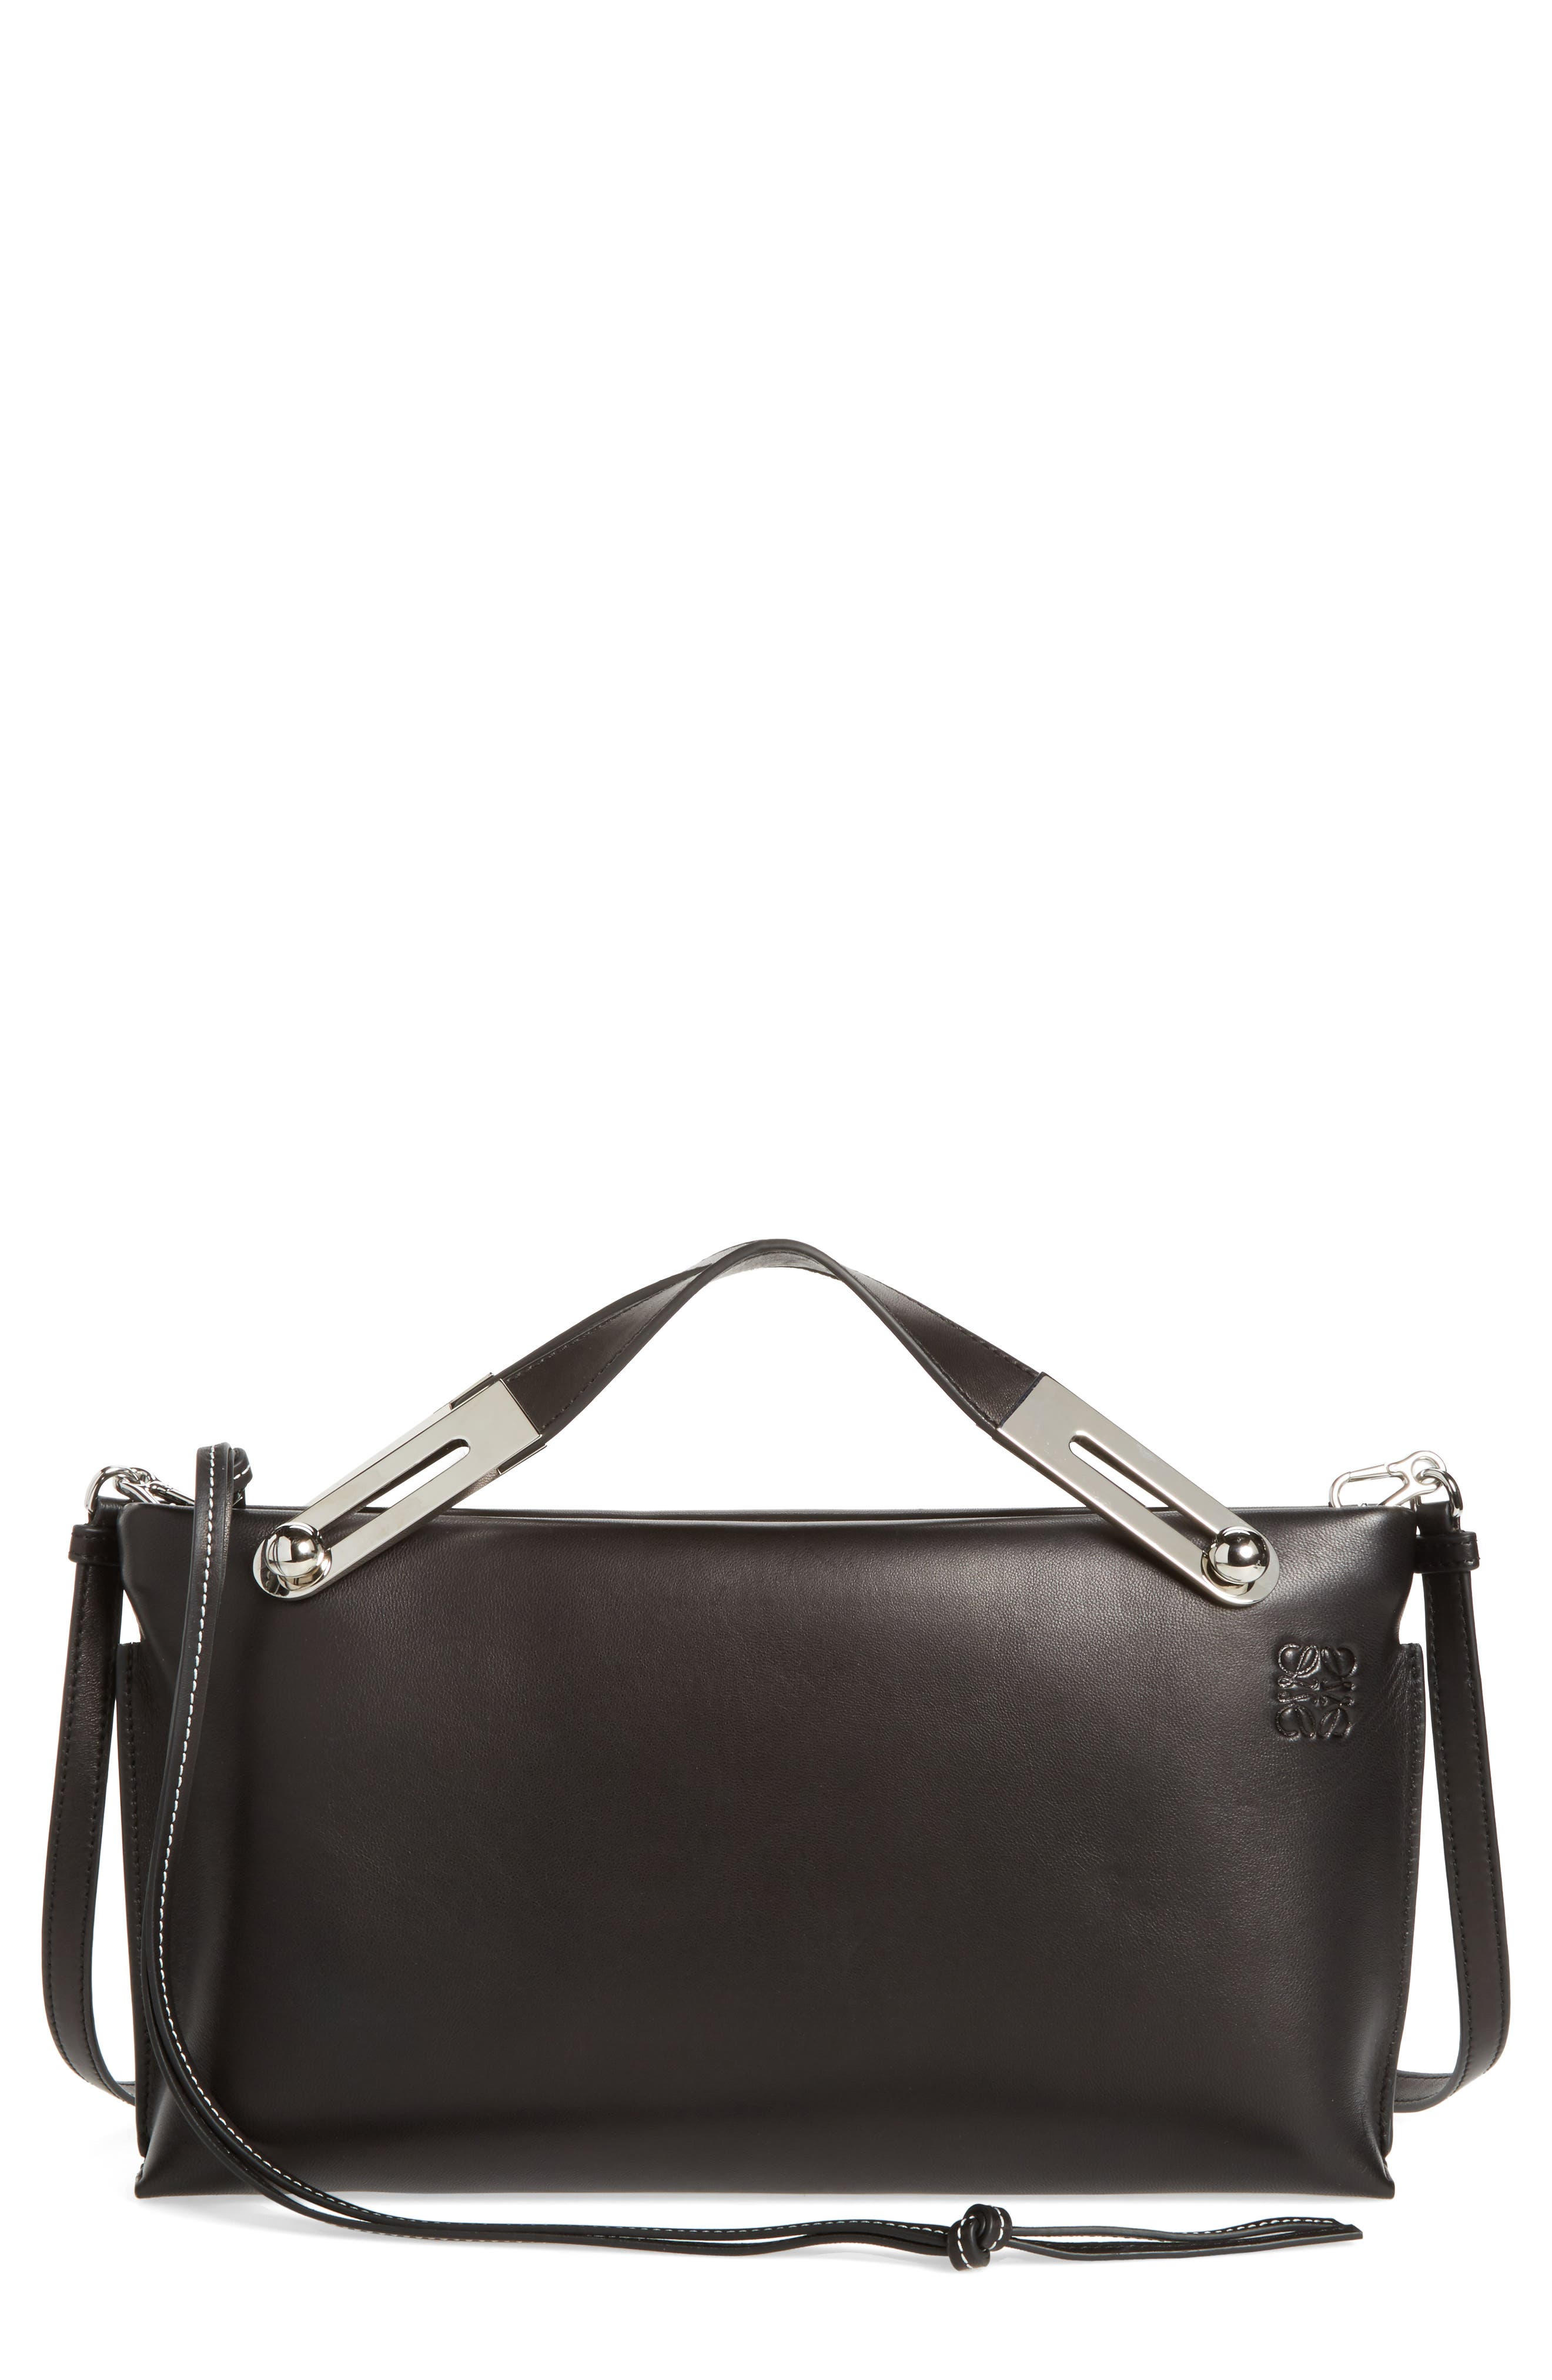 Missy Lambskin Leather Shoulder Bag,                             Main thumbnail 1, color,                             BLACK